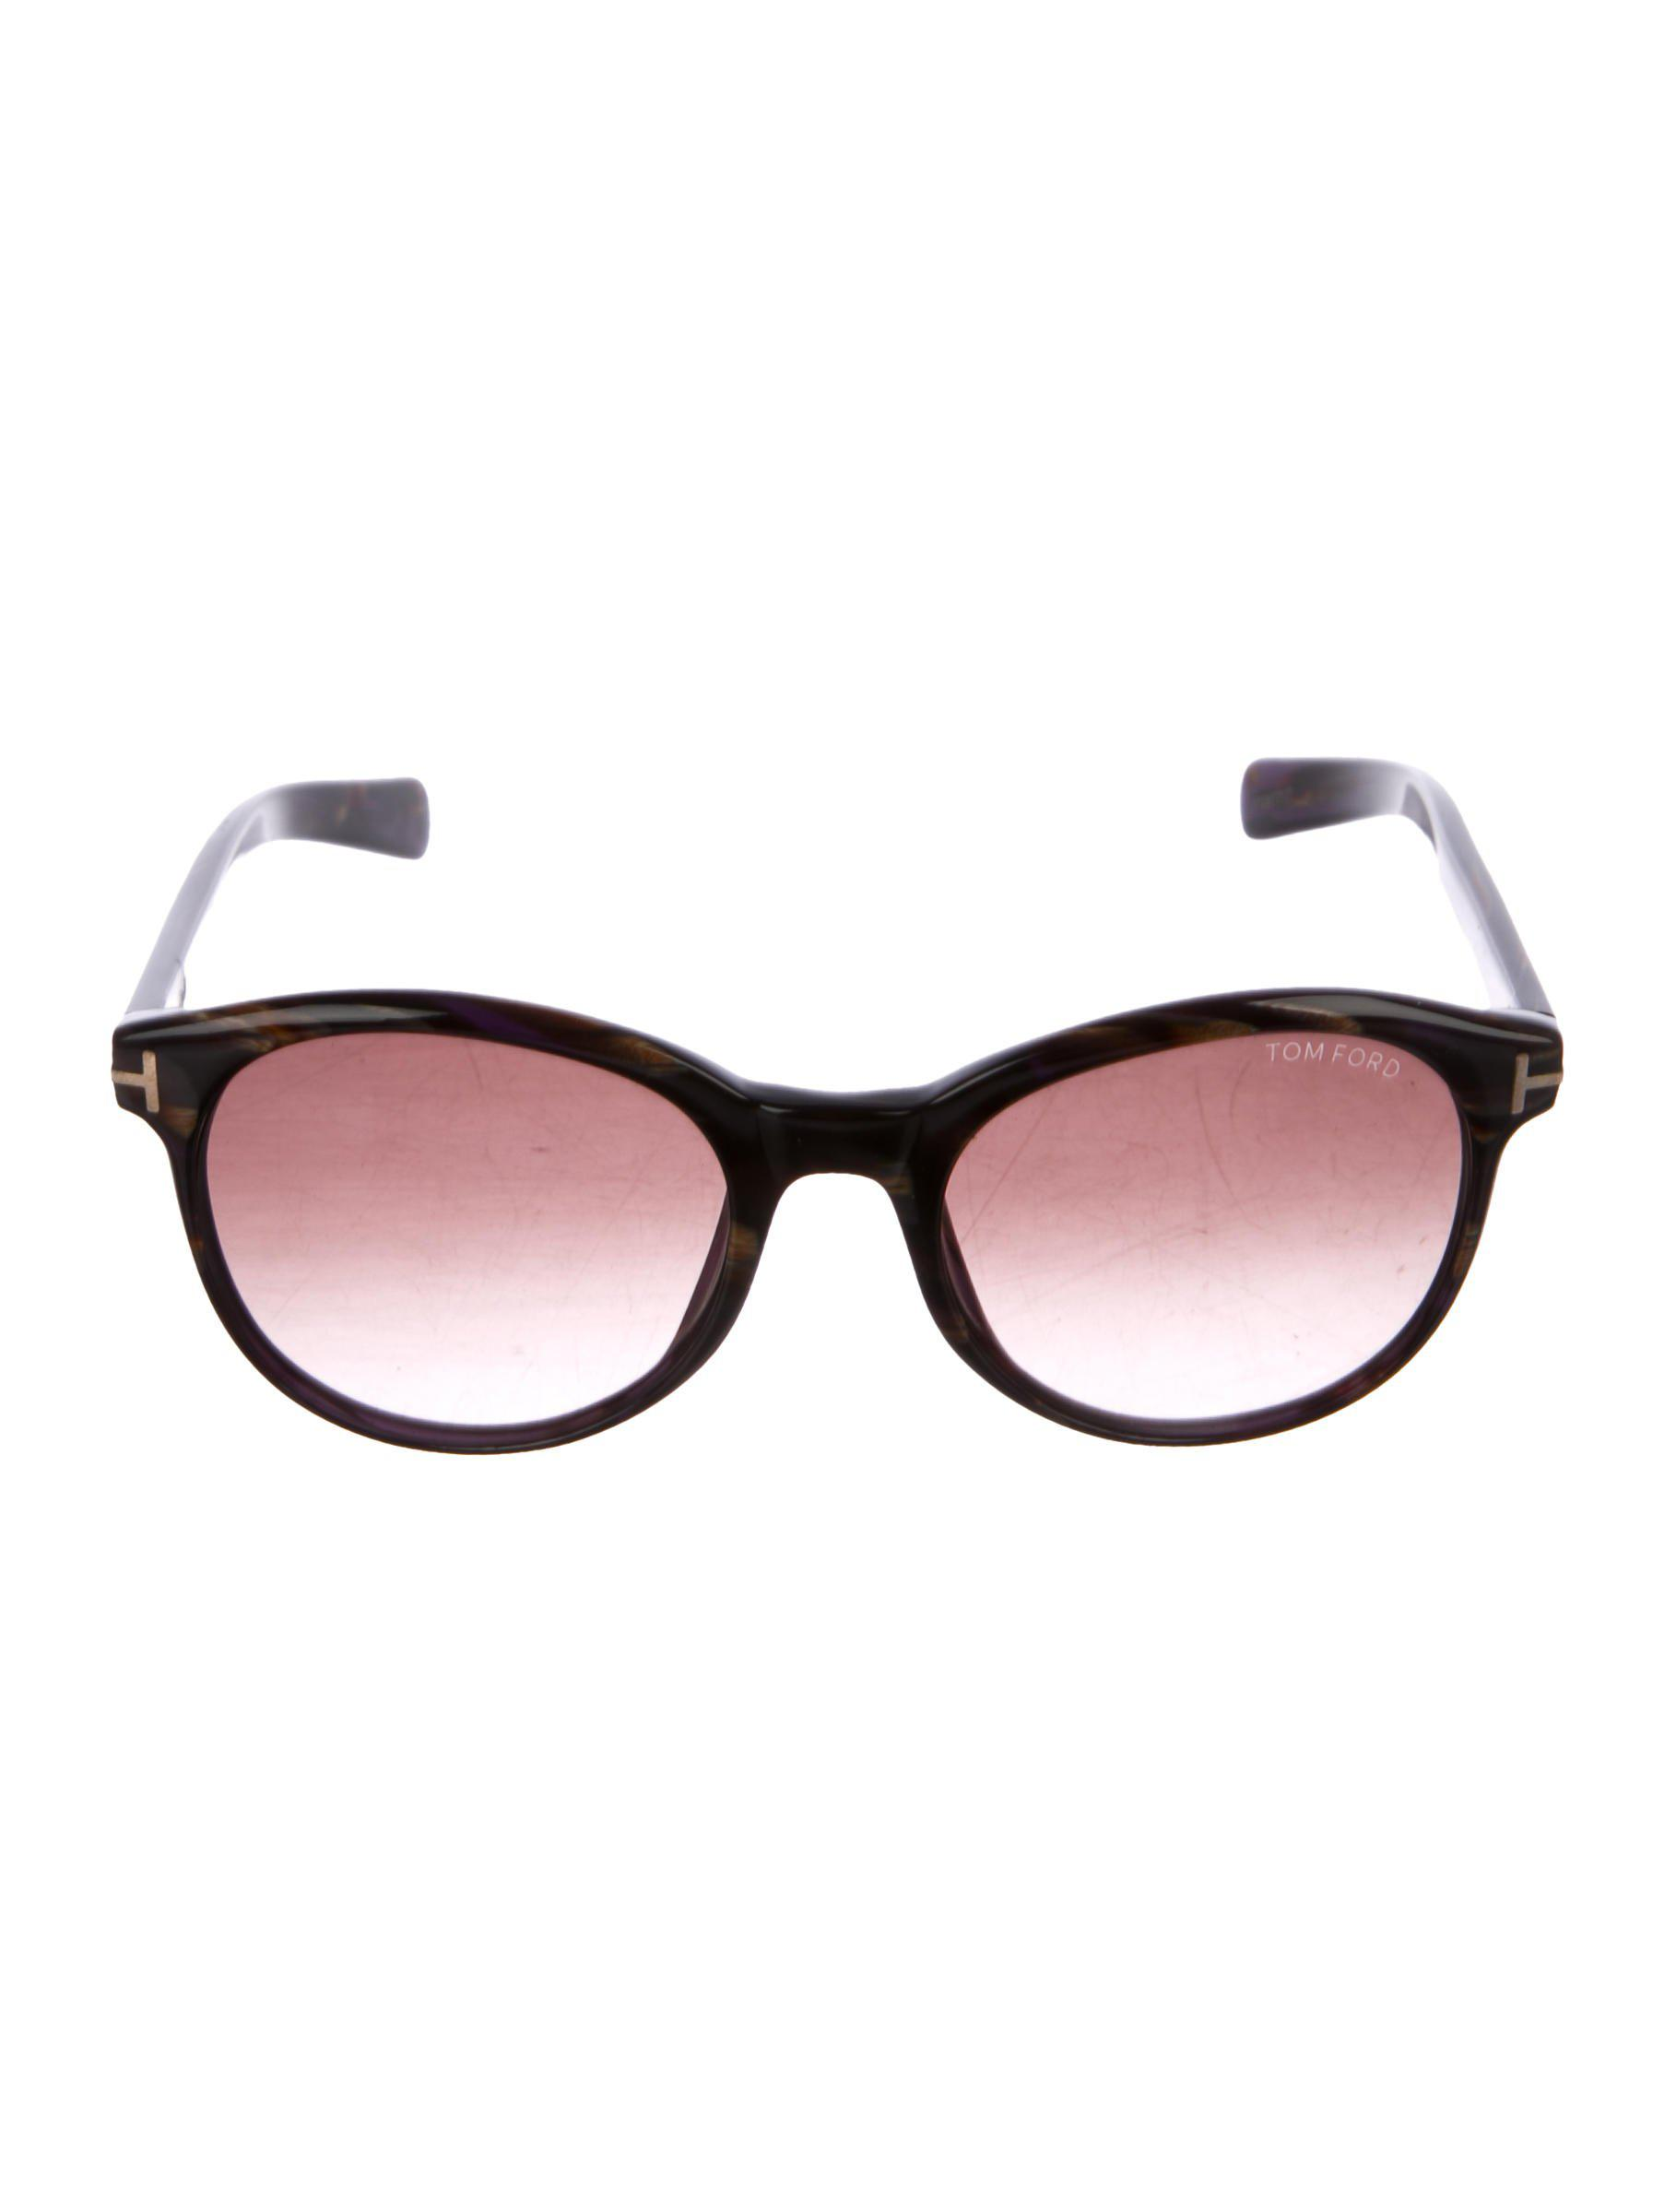 849432fe7497 Tom Ford - Metallic Riley Marbled Sunglasses Brown - Lyst. View fullscreen